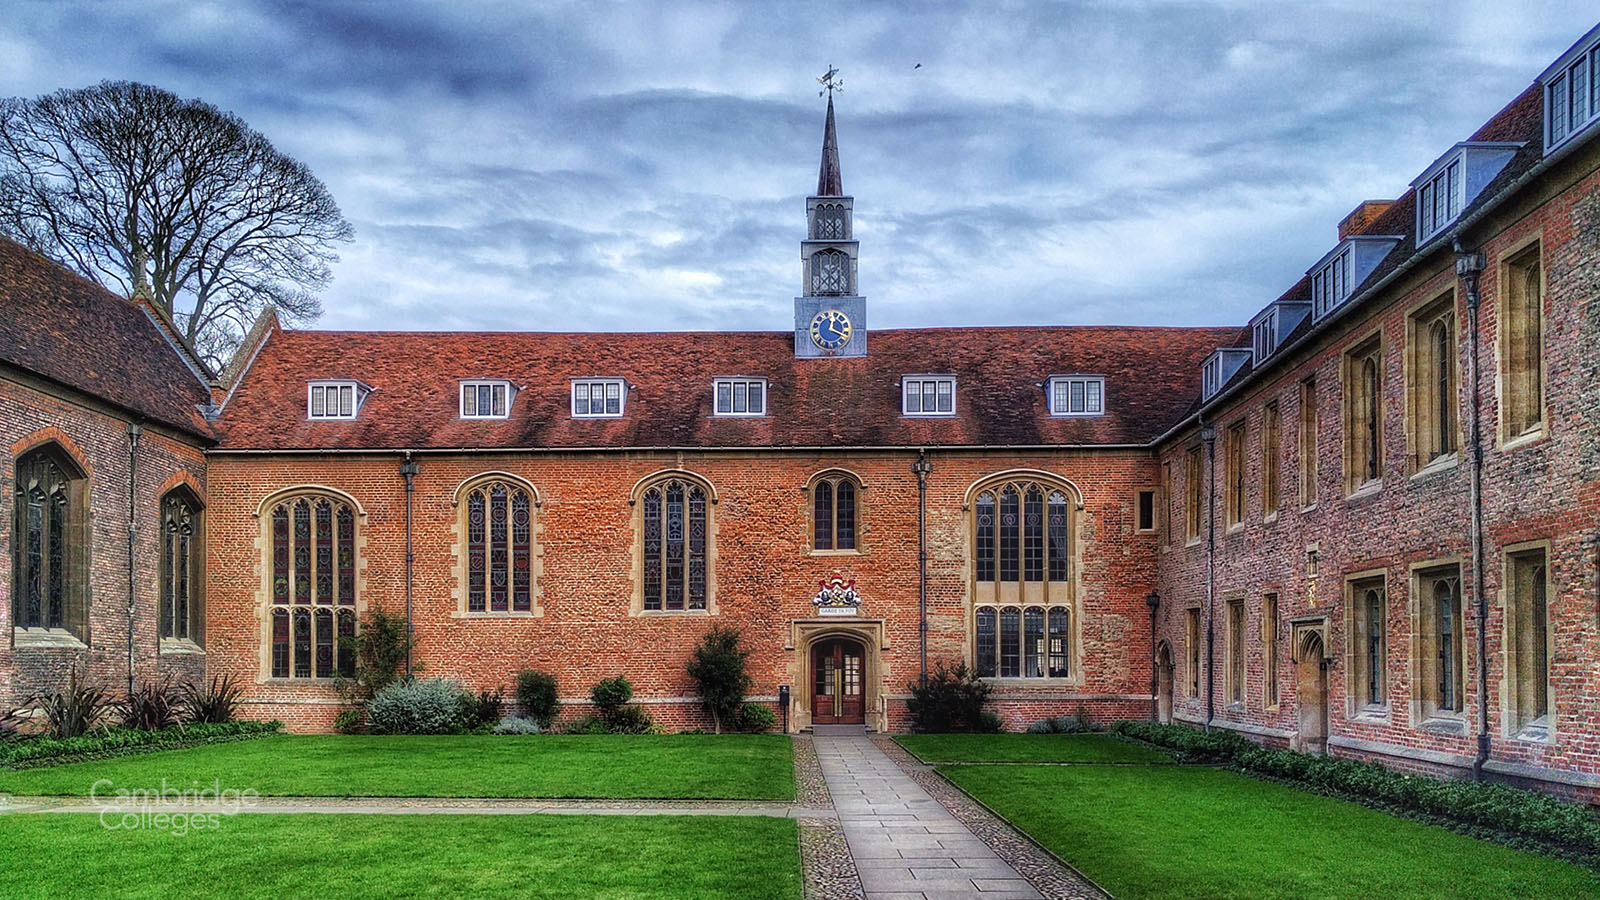 Magdalene college, Cambridge